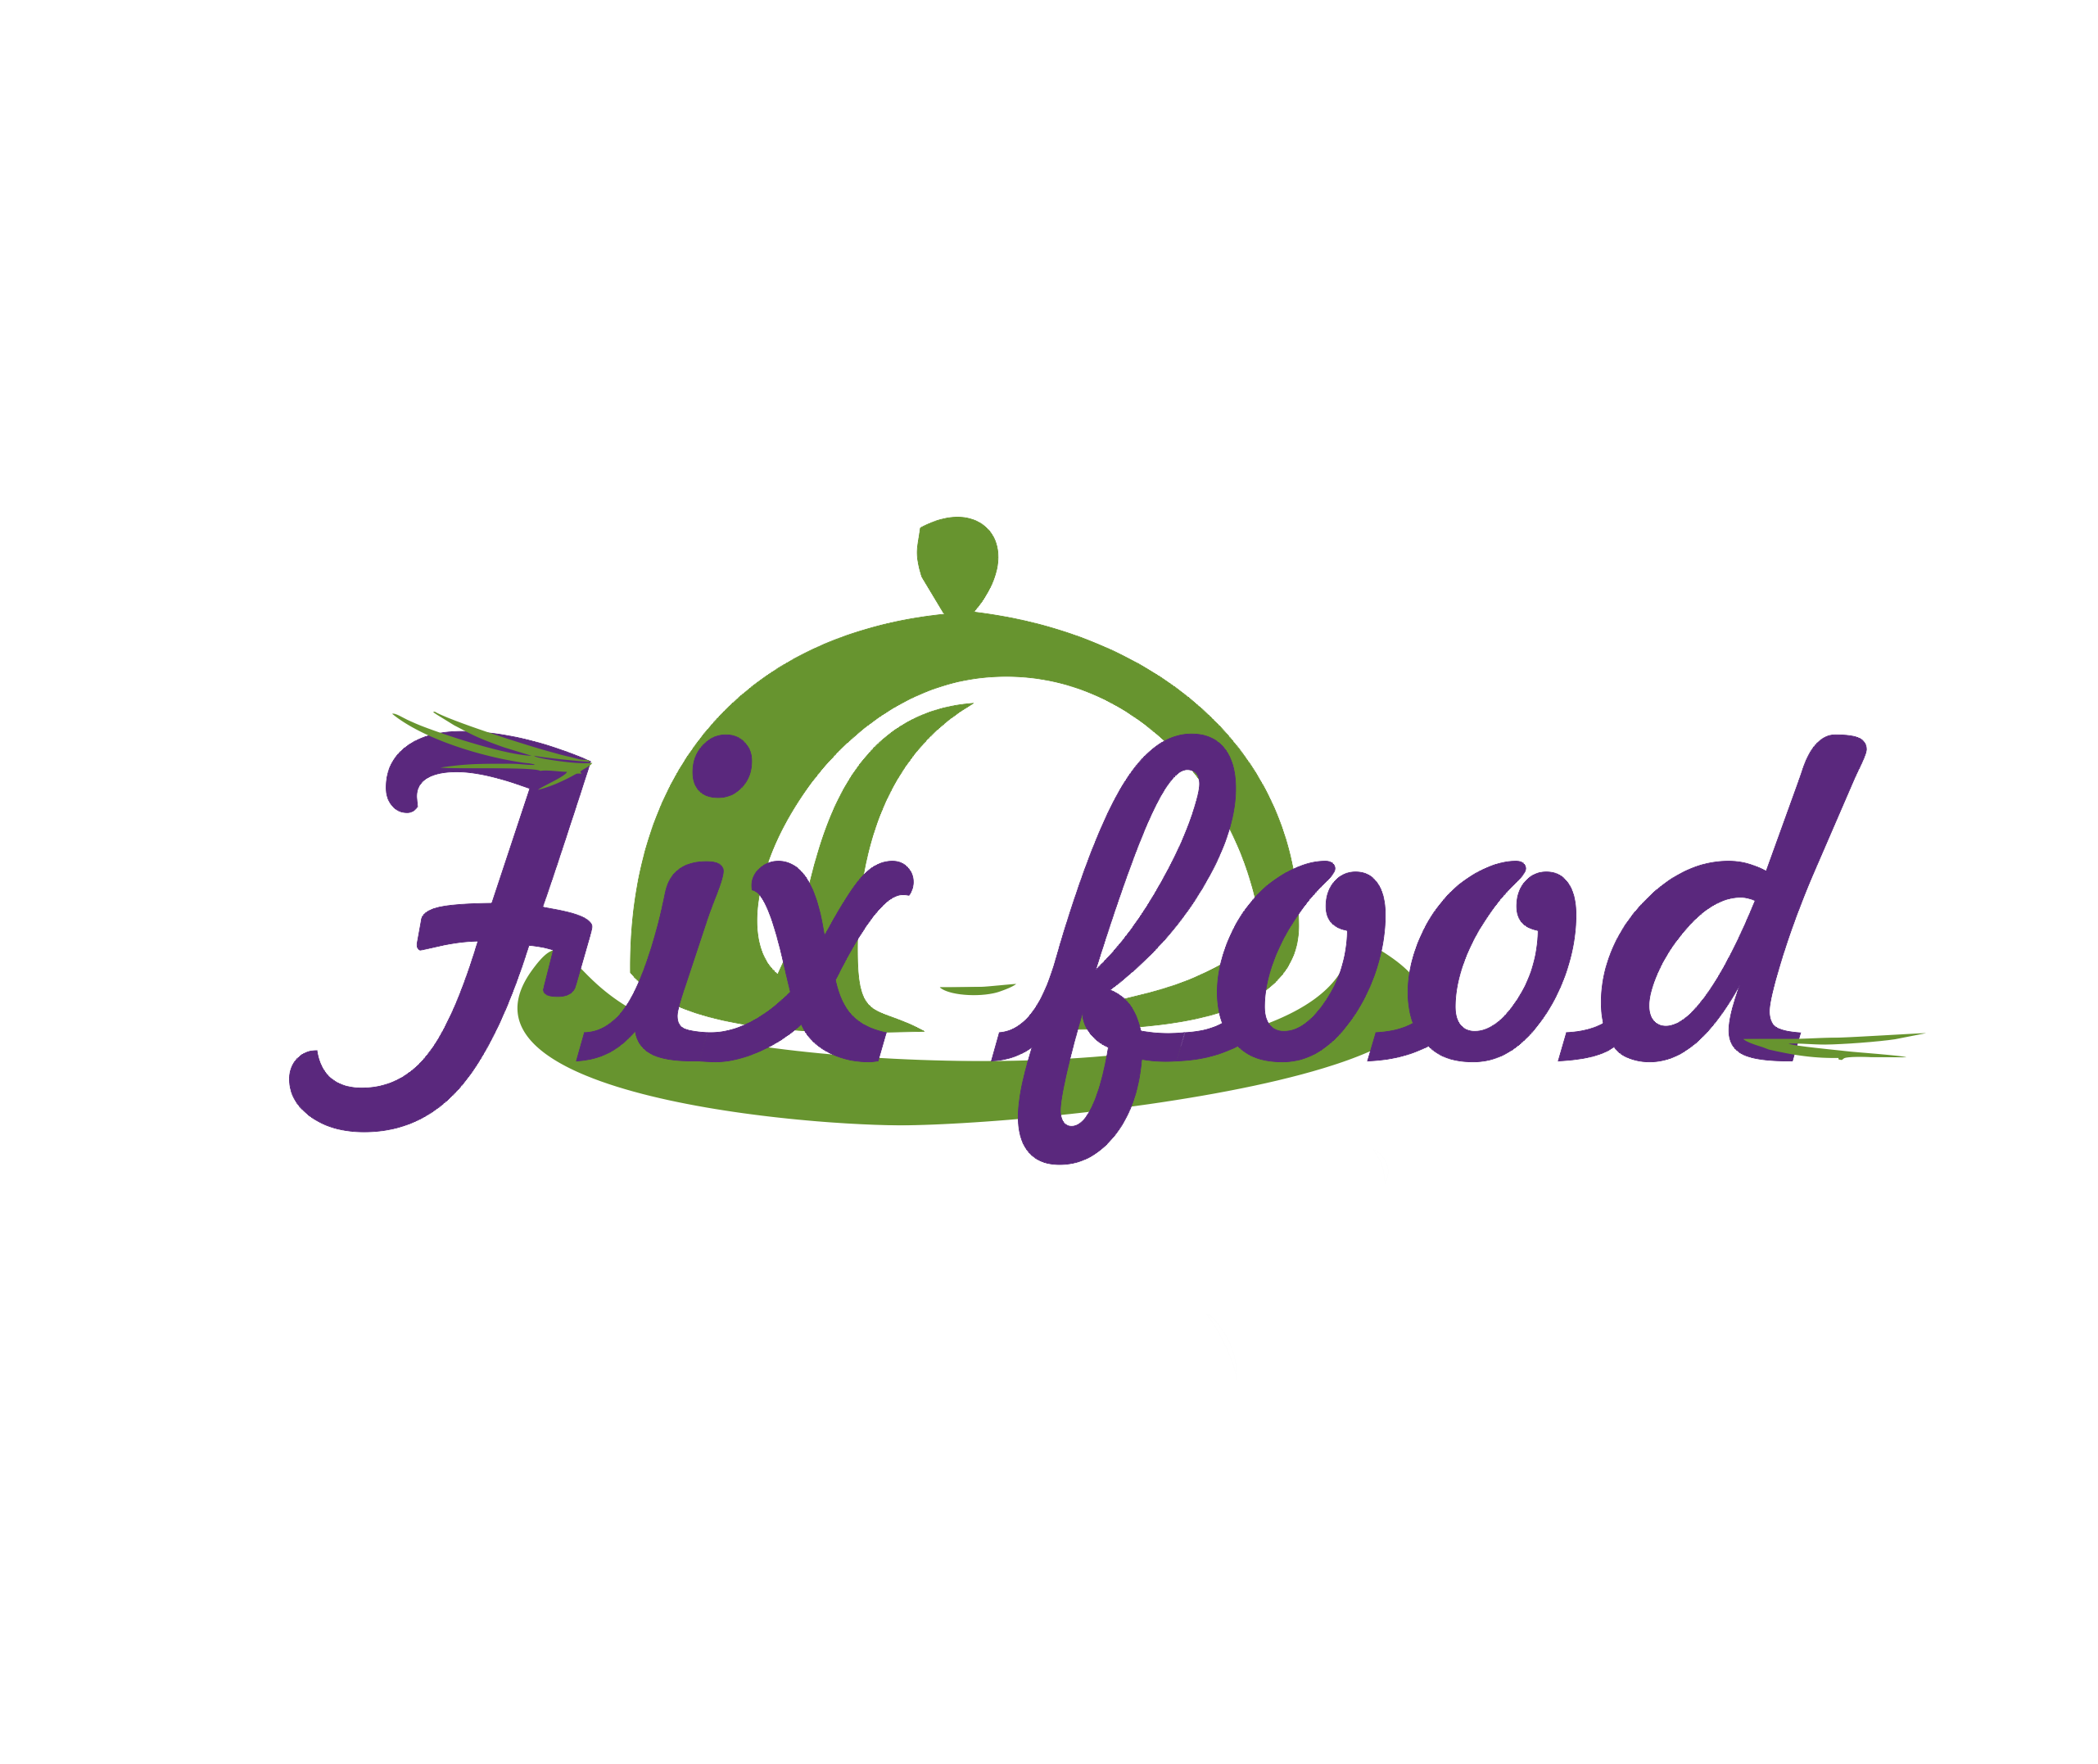 Логотип для доставки еды фото f_2145ec932c4a59d7.png